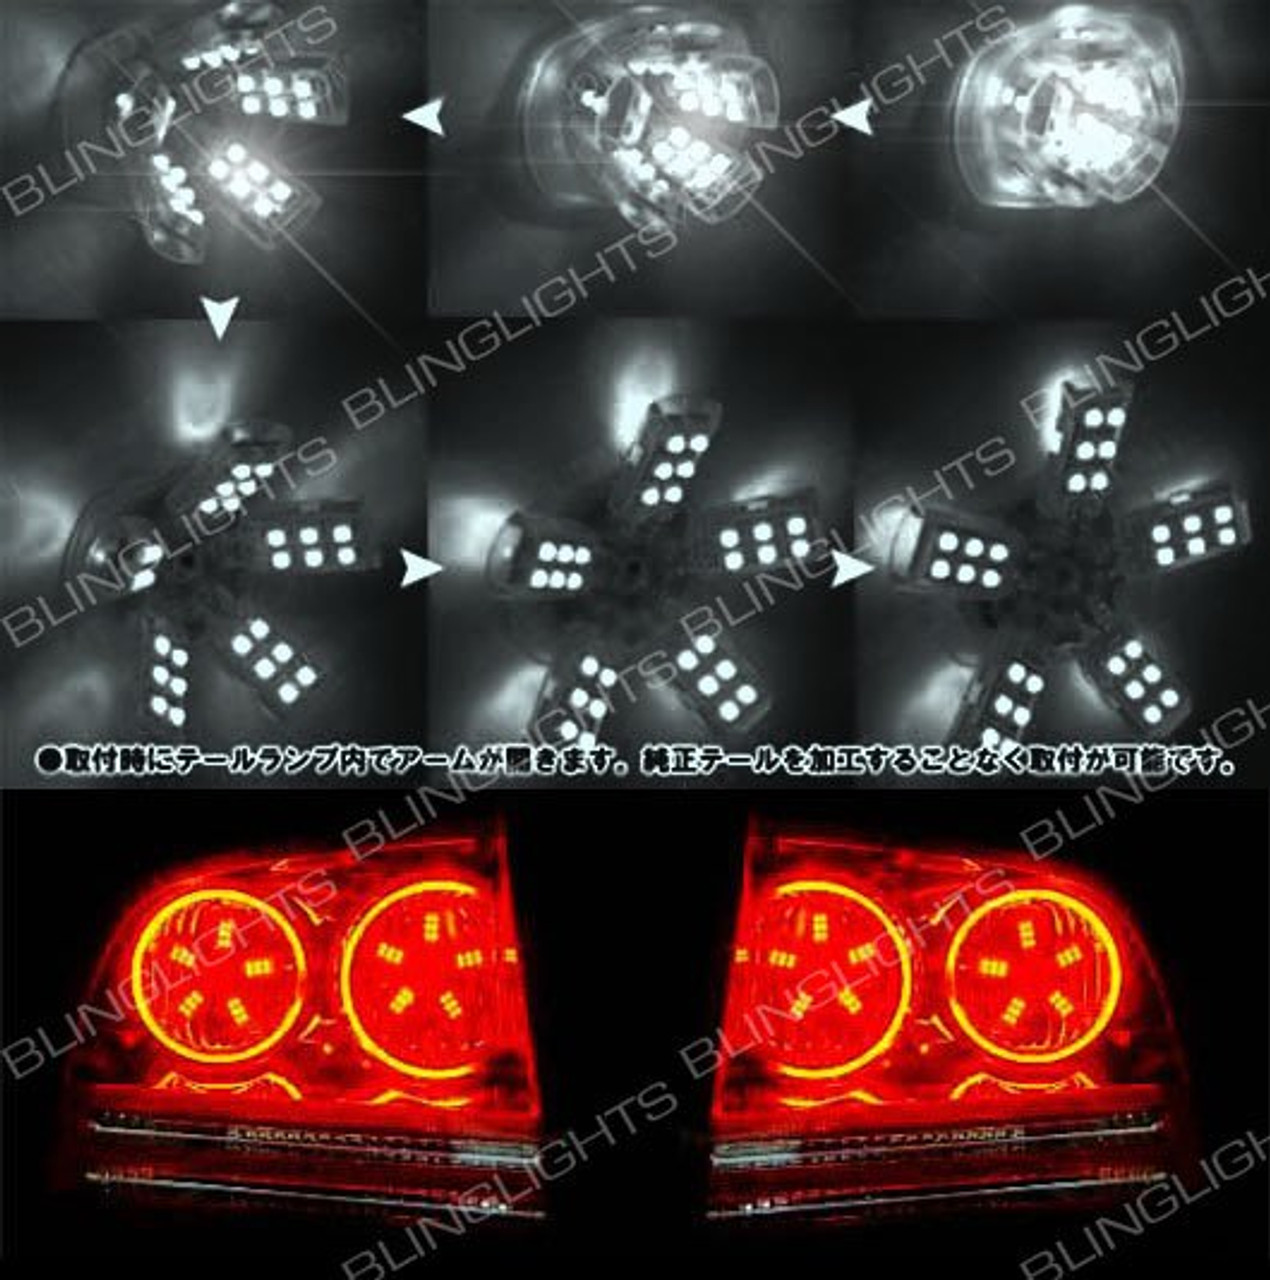 Chevrolet Silverado Custom LED Spider Tail Lamp Light Bulbs Set